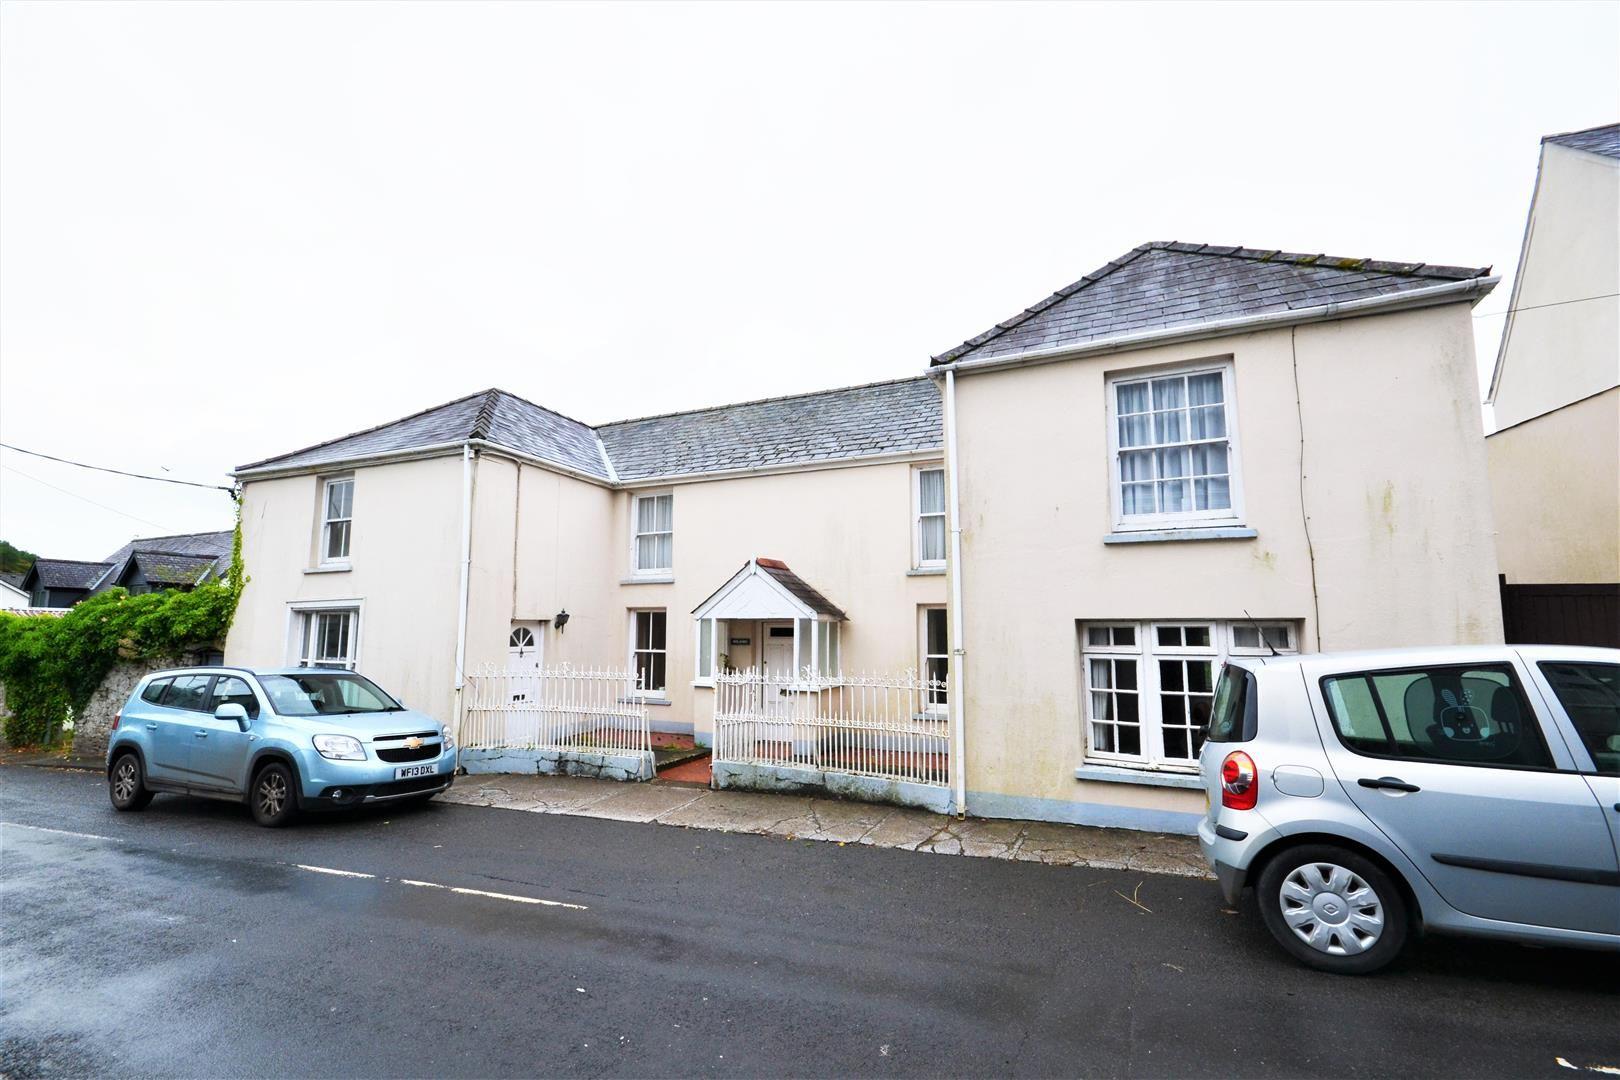 Property photo 1 of 31. Dsc_0896.Jpg